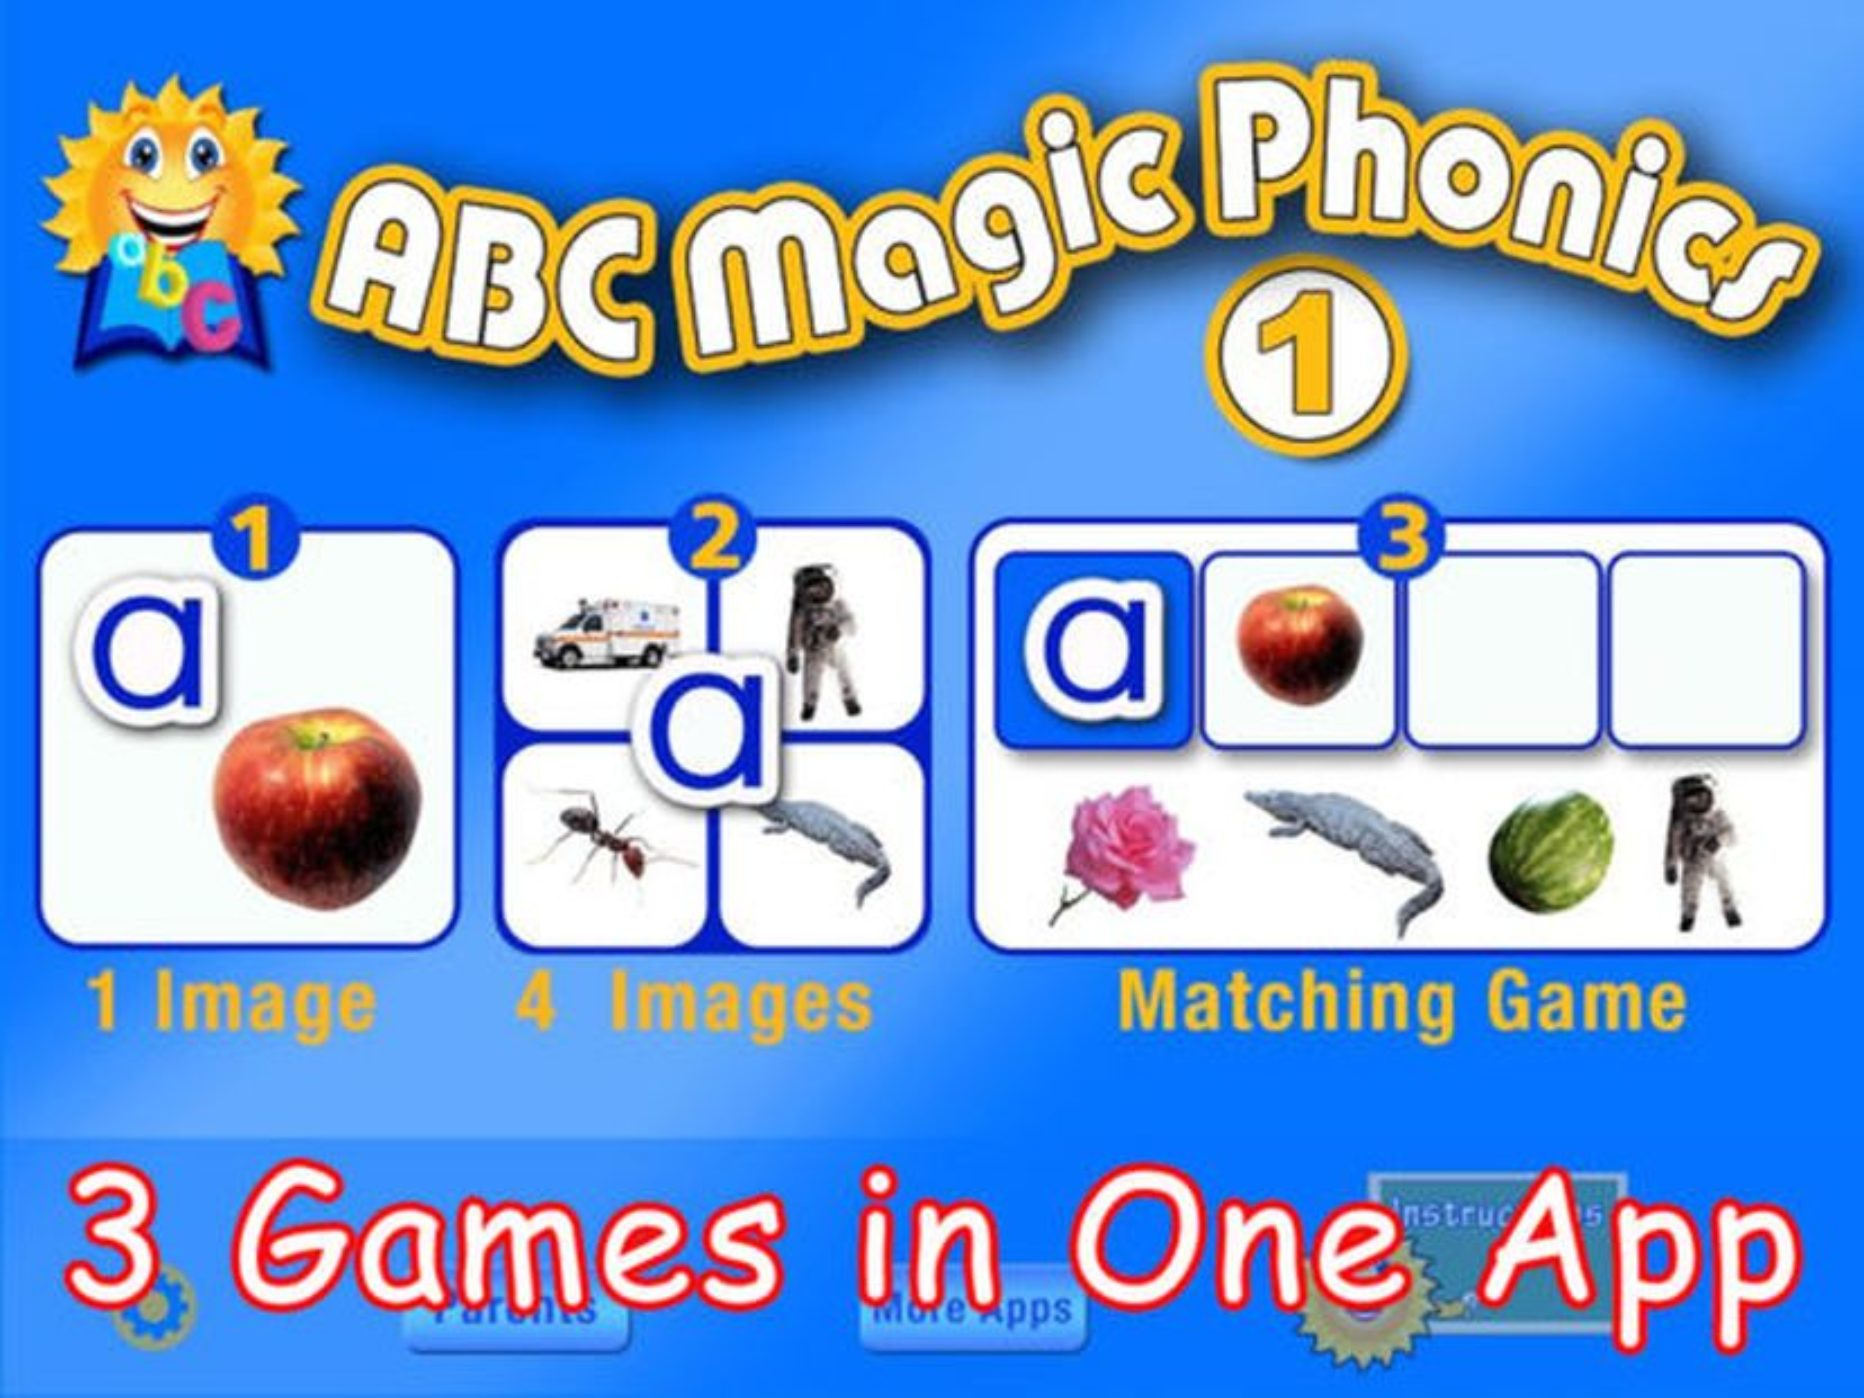 ABC Magic App Helps Kids Learn to Read Early Using Fun Phonics